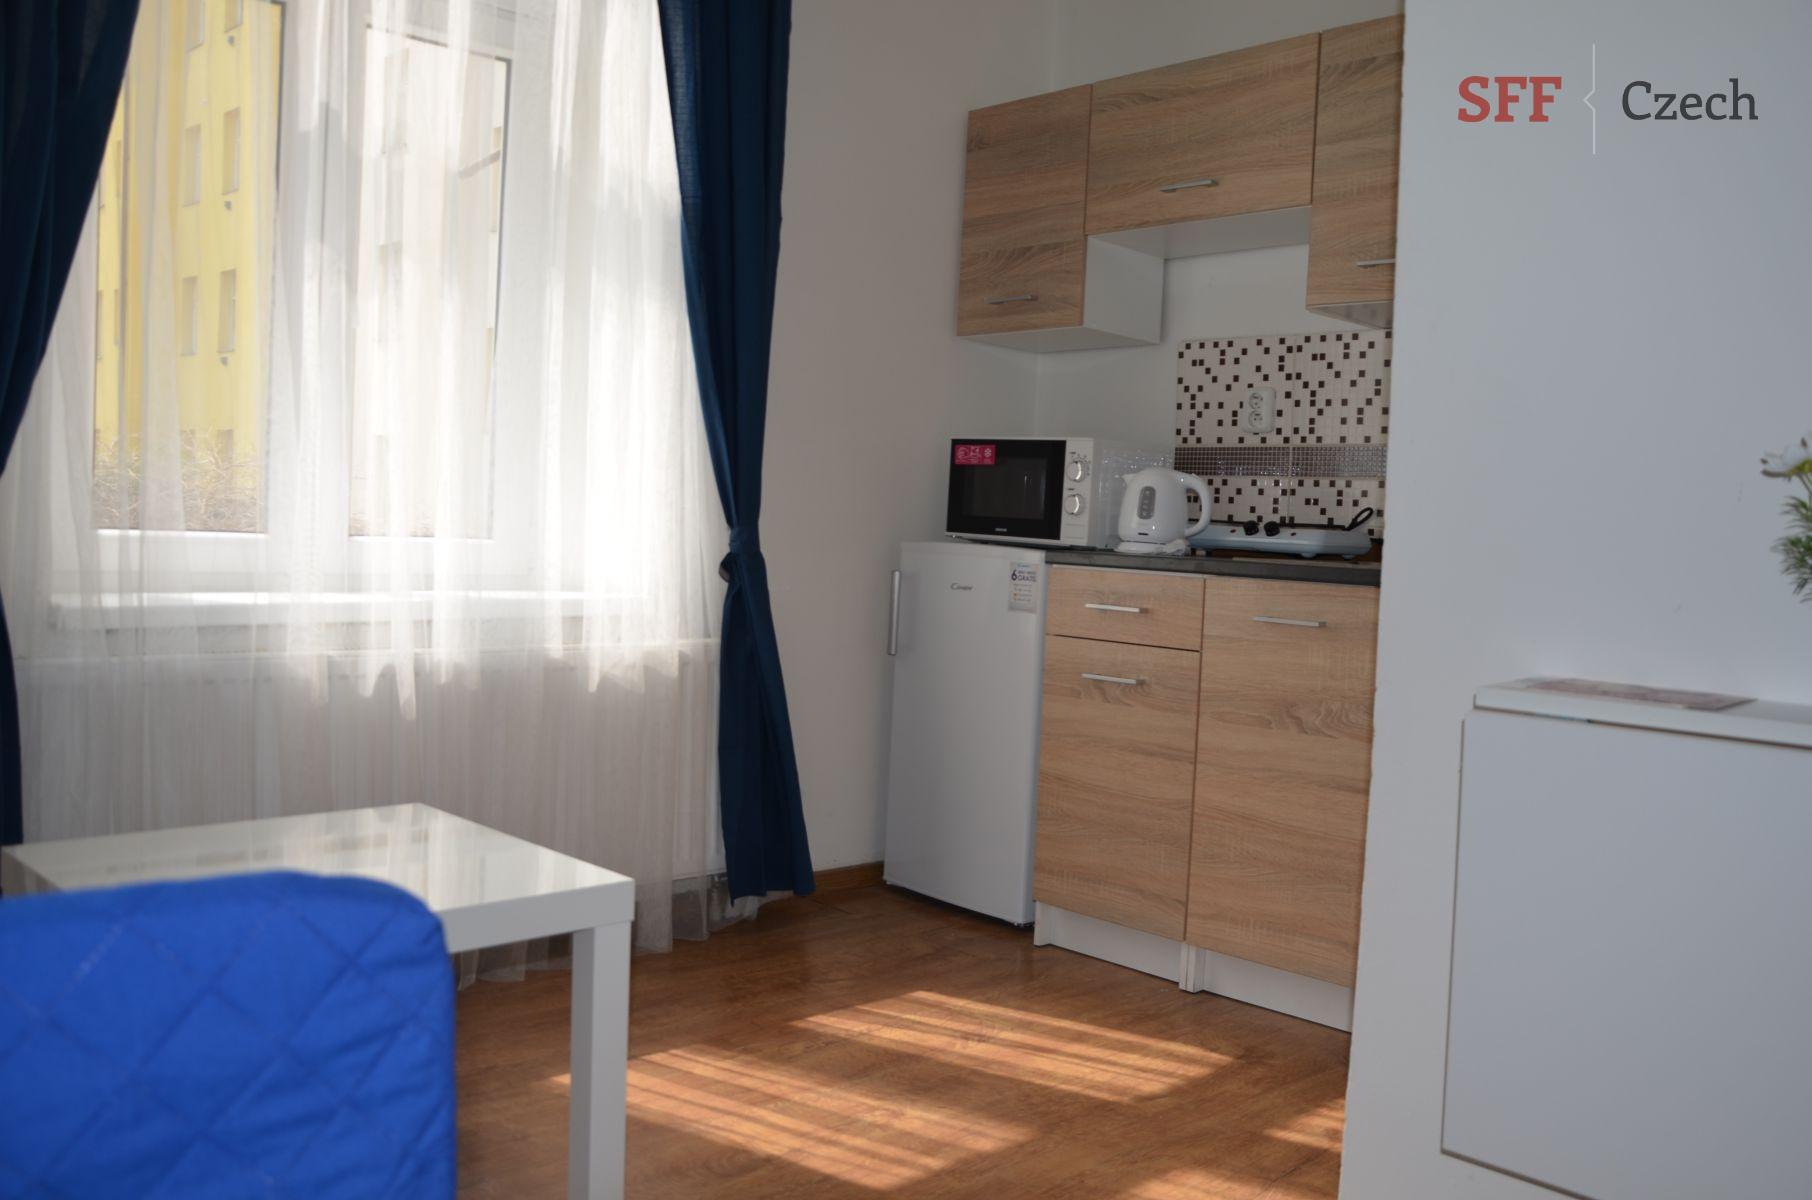 Vybavené studio k pronájmu Praha 4 Nusle blízko centra